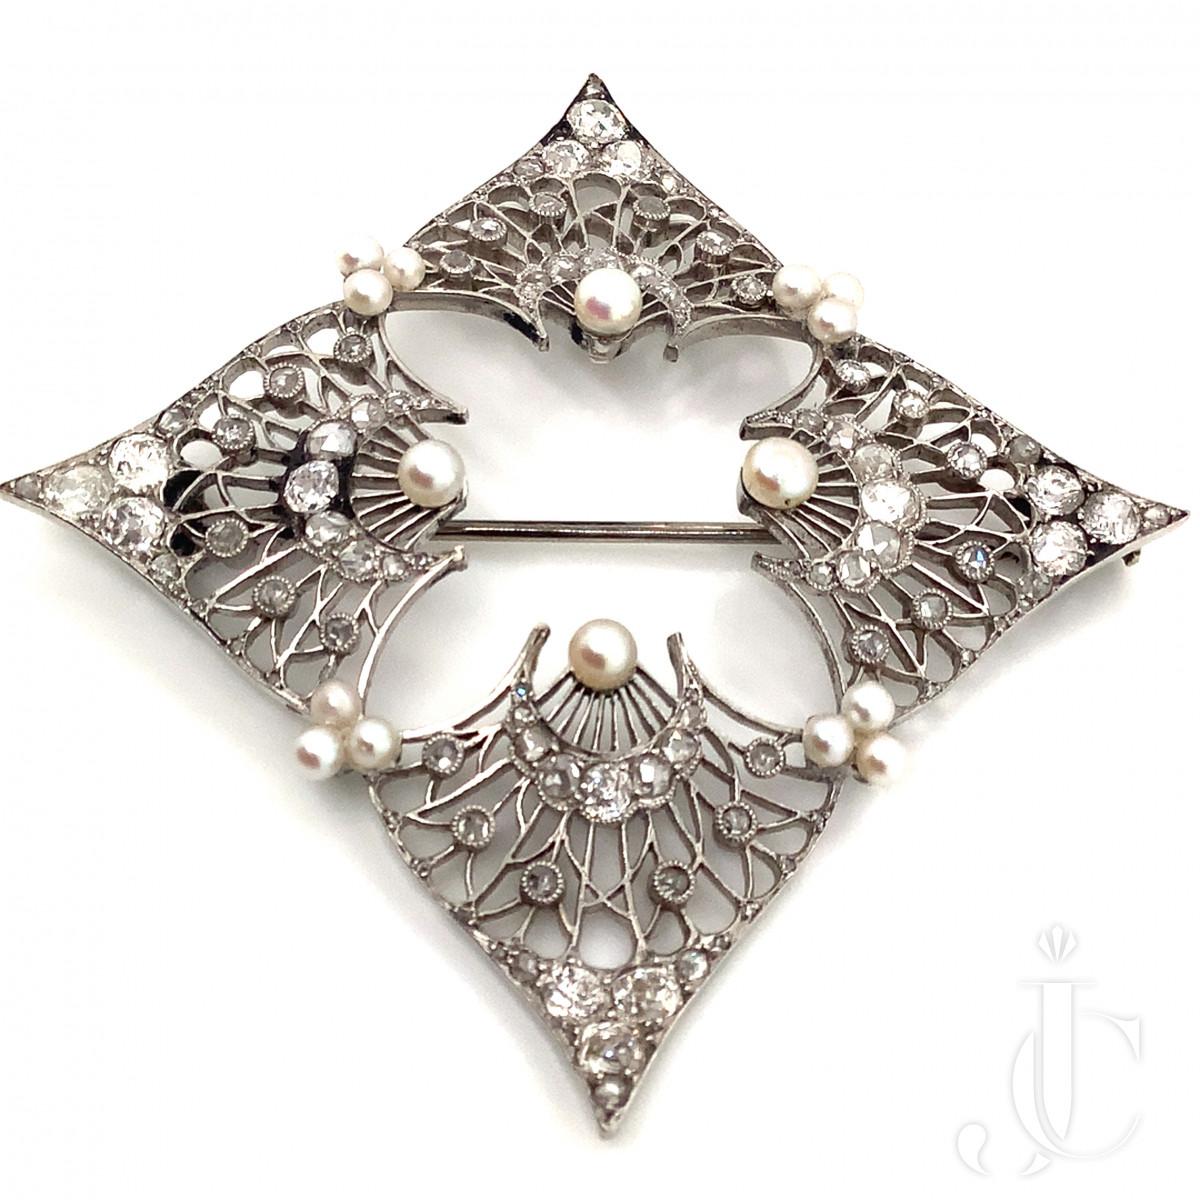 Edwardian Diamond and Seed Pearl Brooch